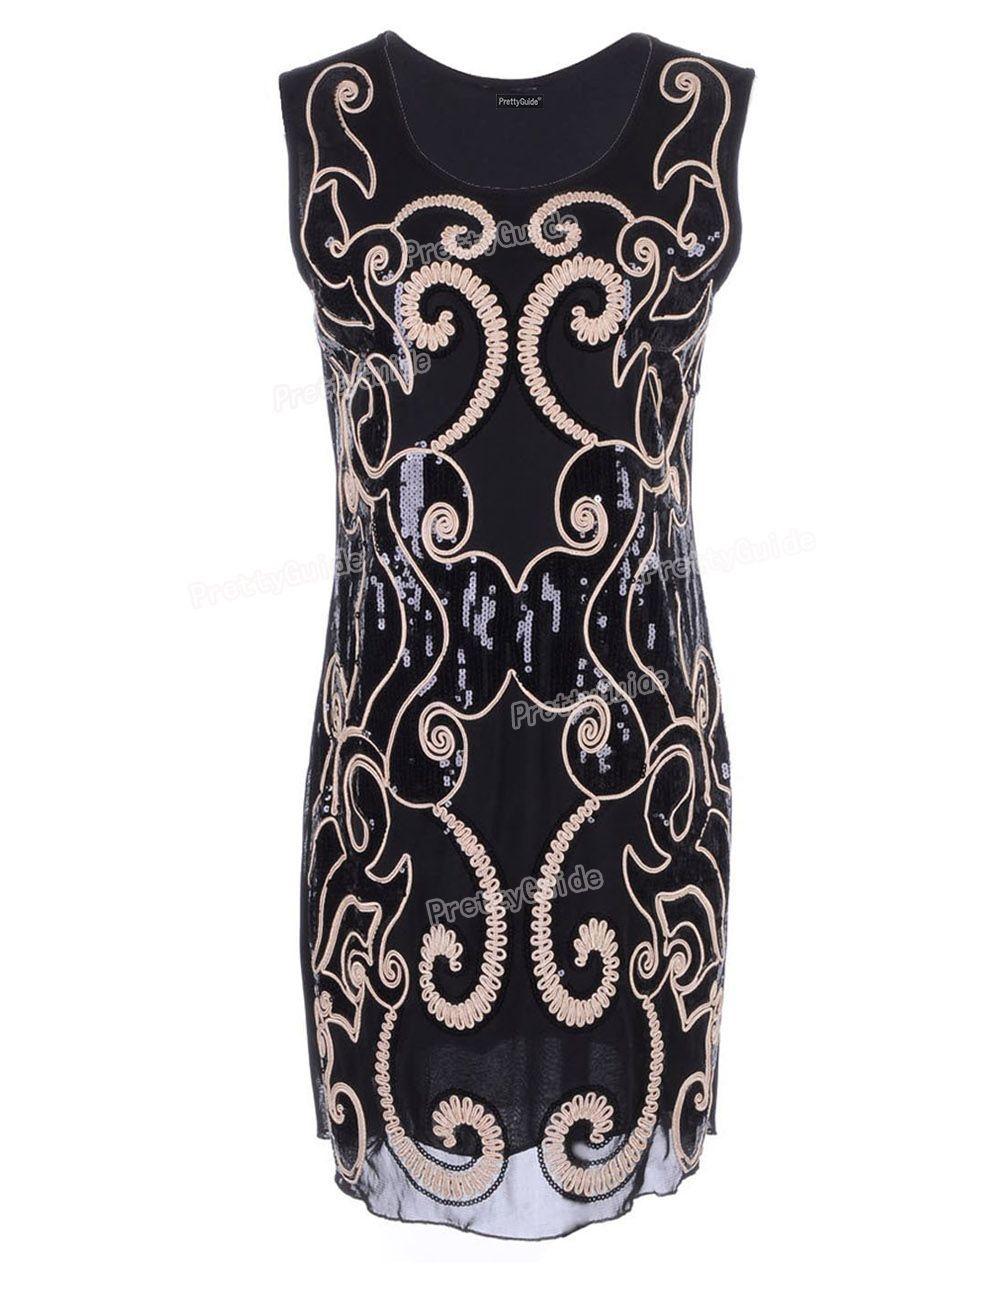 PrettyGuide Women 1920s Vintage Totem Swirling Art Deco Pattern Sequin  Embellished Shift Dress Great Gatsby Flapper 6141b7f6f23b9